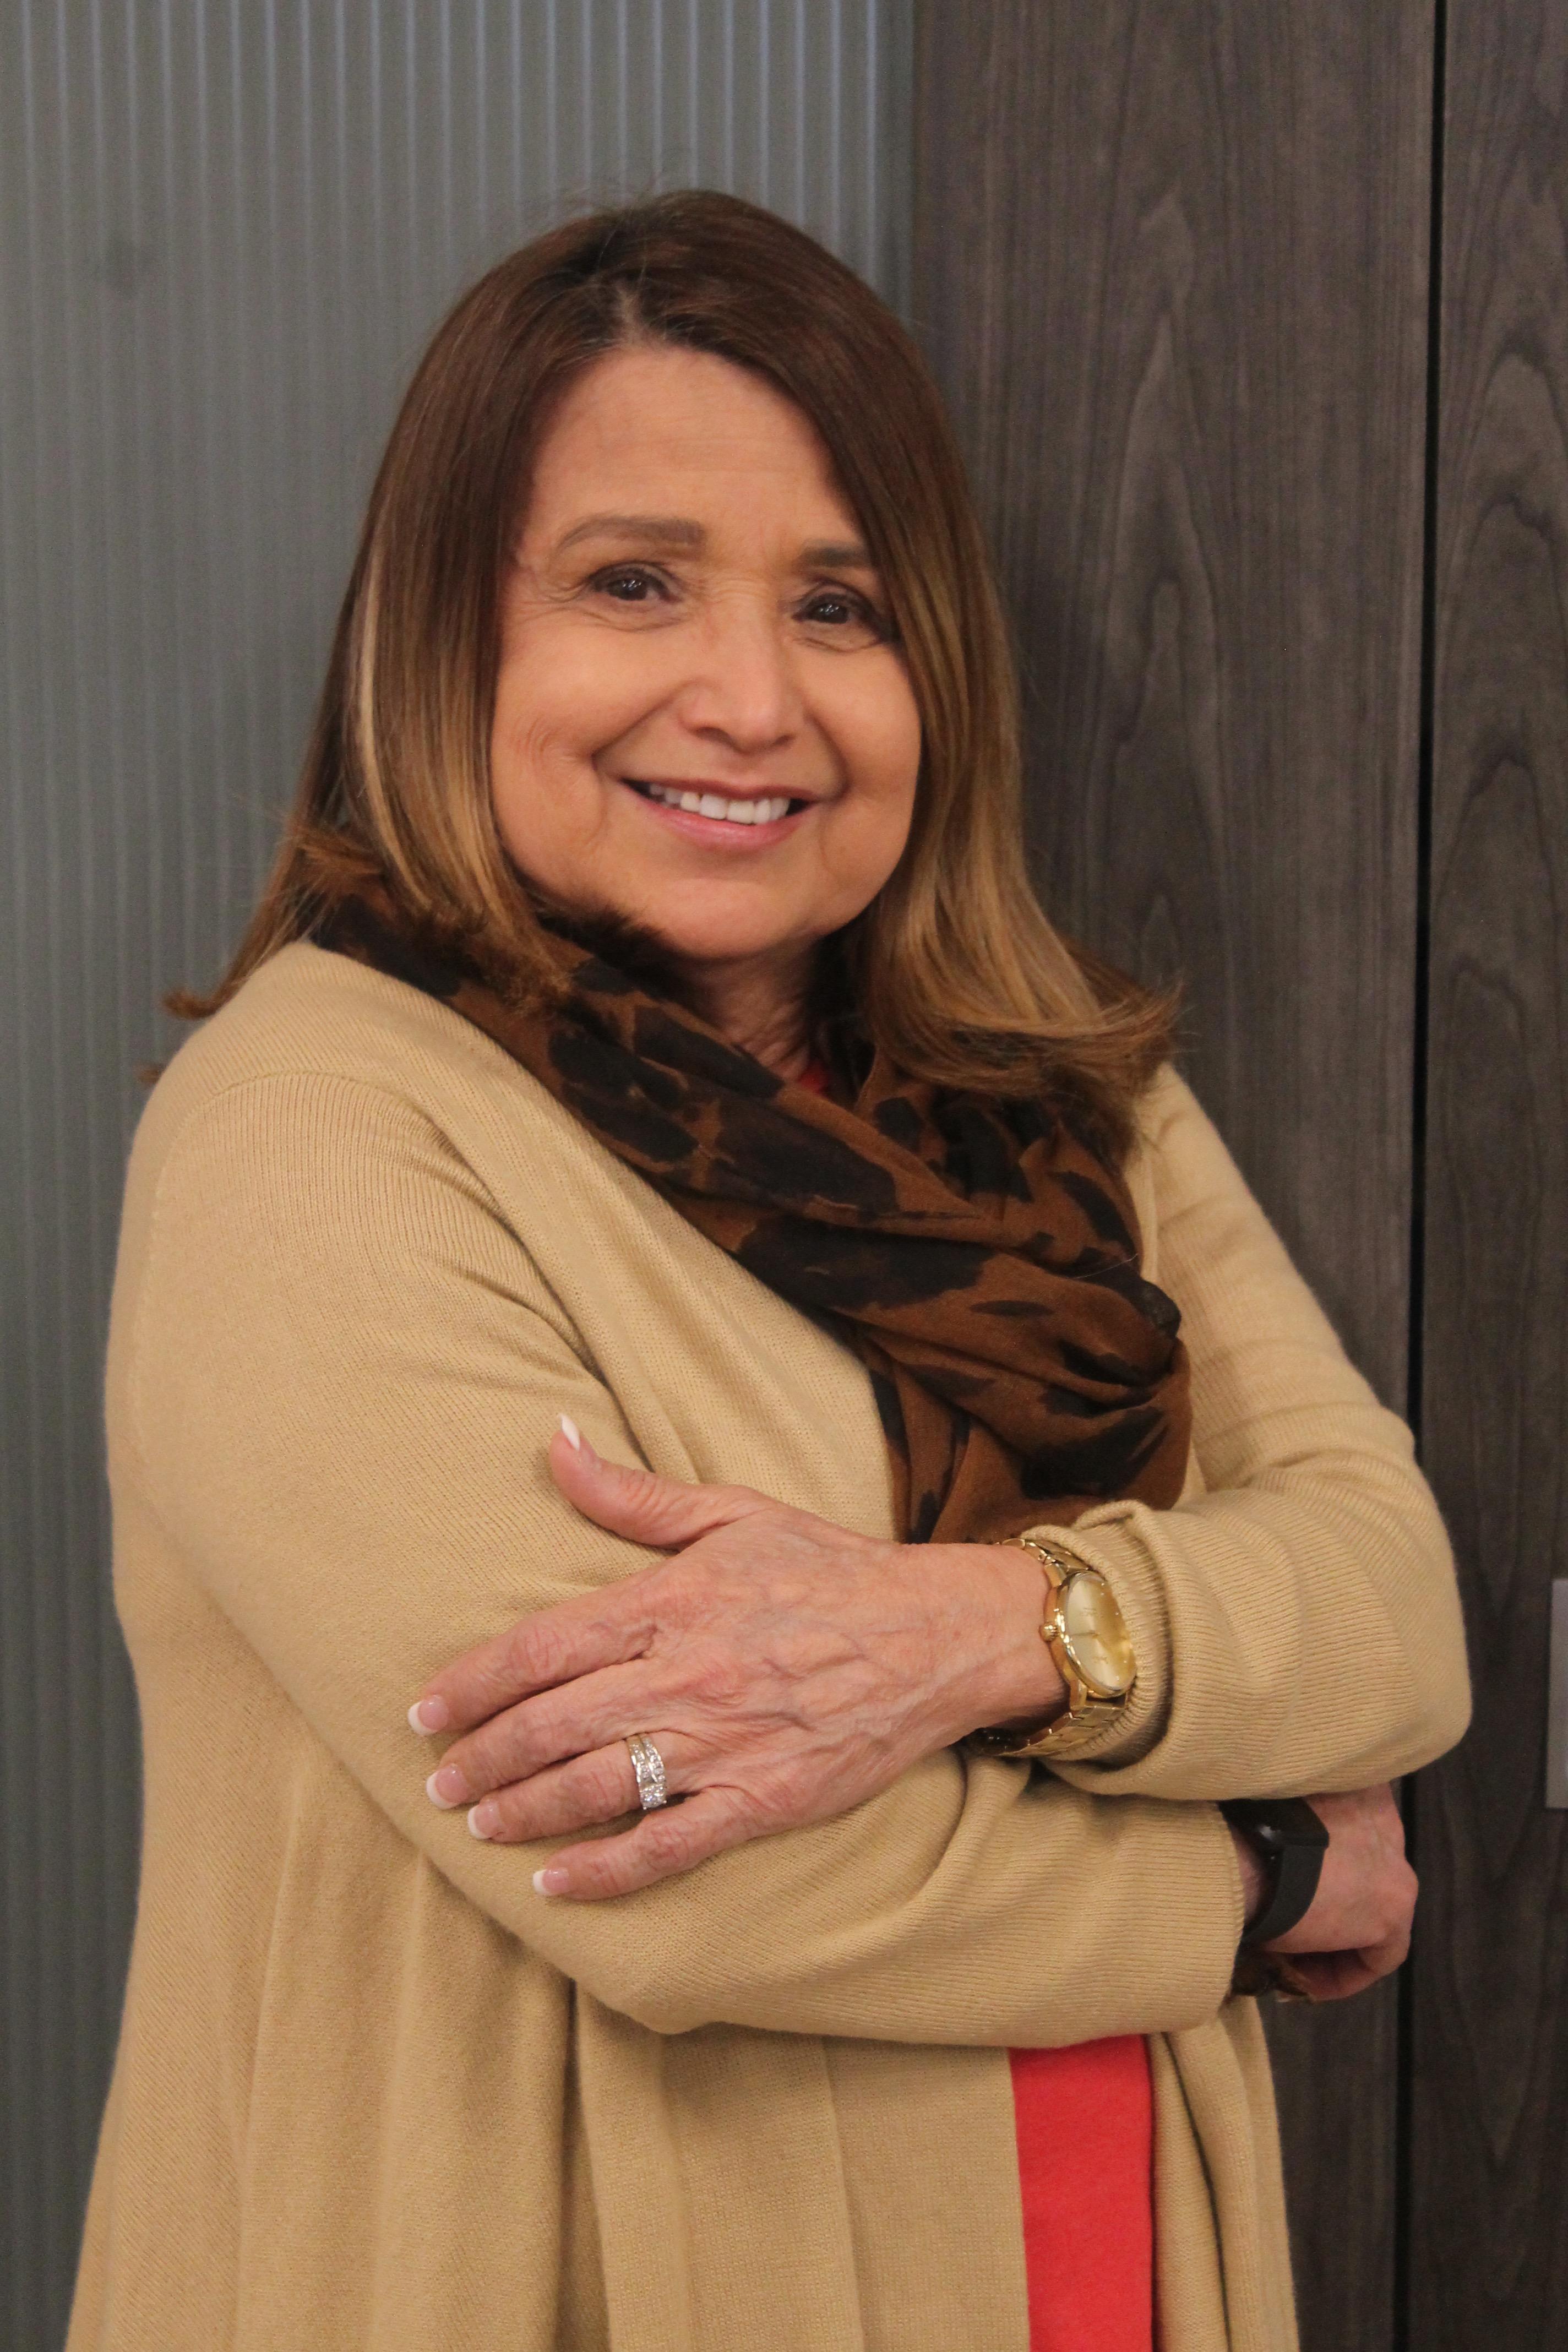 Yolanda Garcia